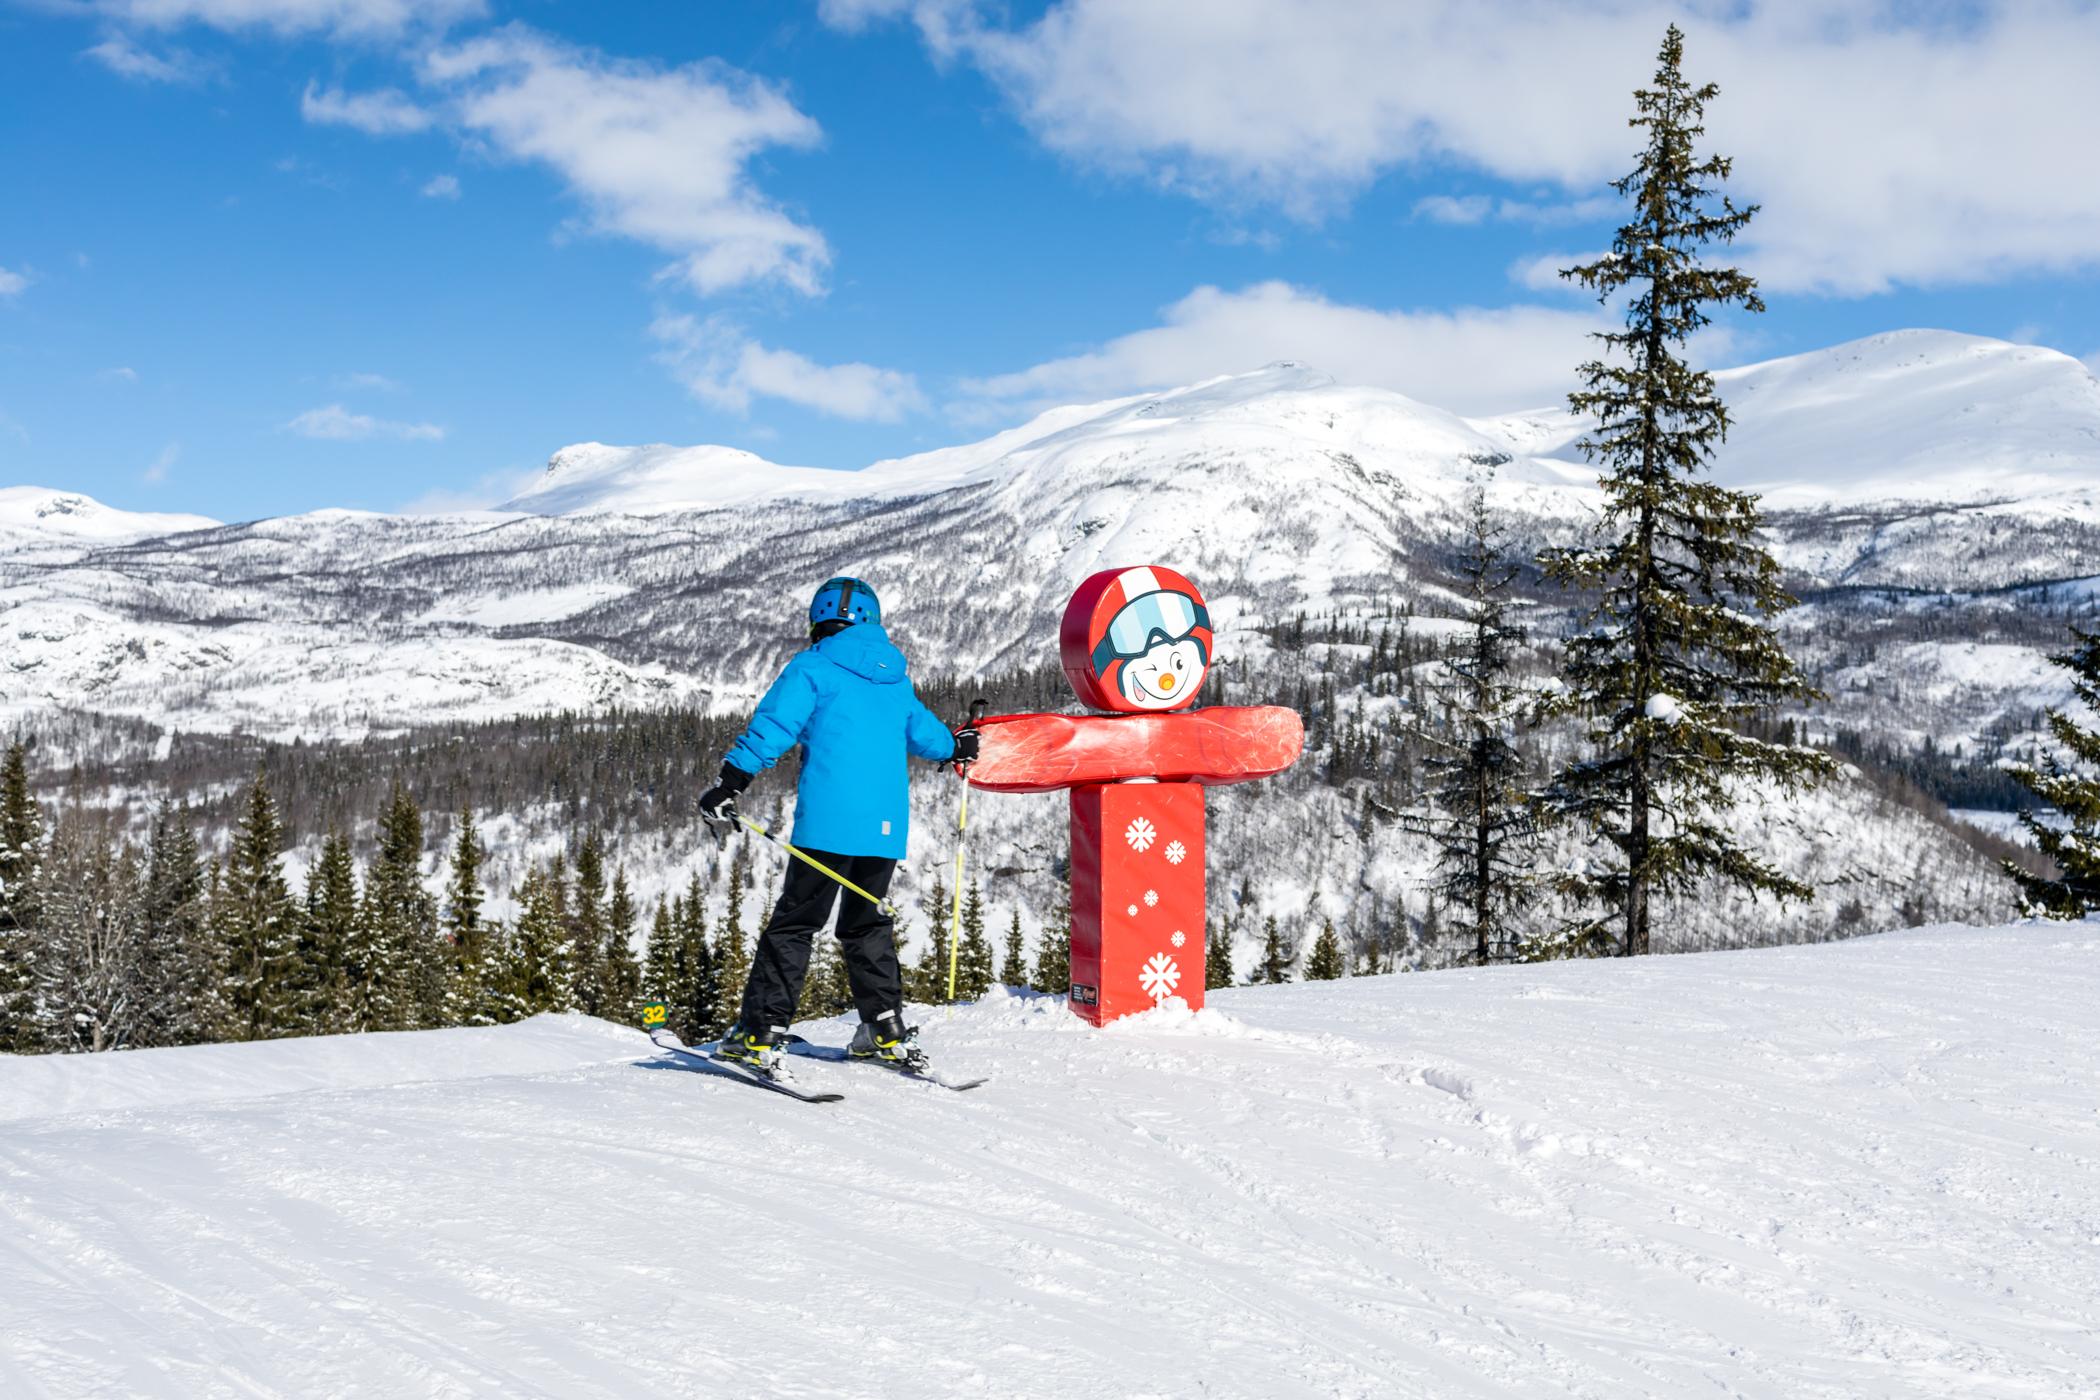 SkiStar-maskotten Valle er altid klar til en High-Five på fun-slopen // Foto: Troels Kjems